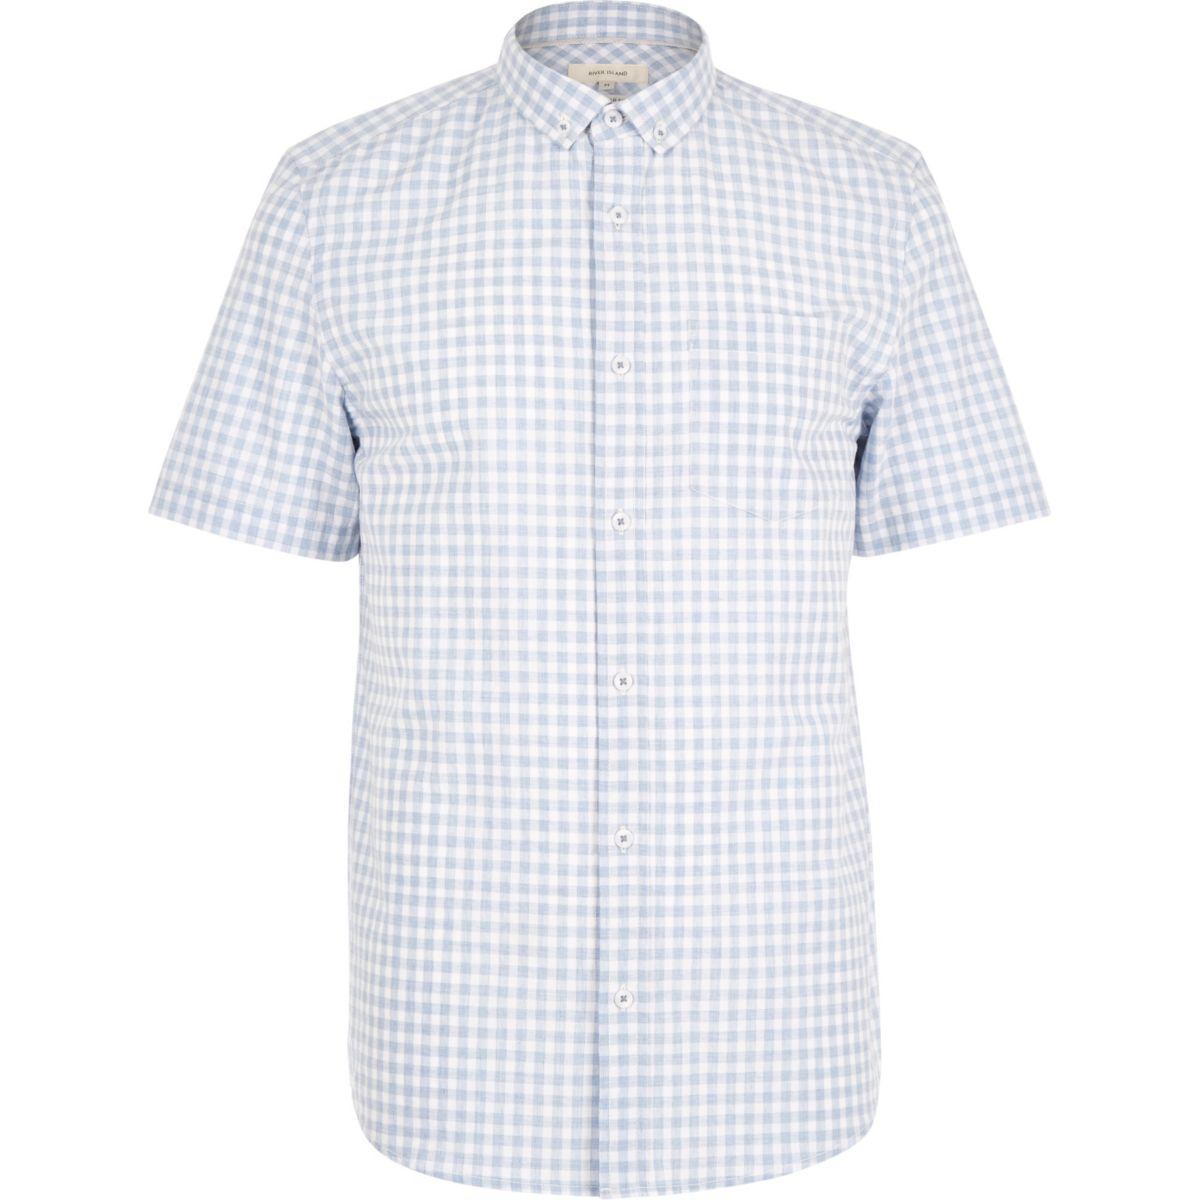 Blau meliertes kurzärmliges Gingan-Hemd